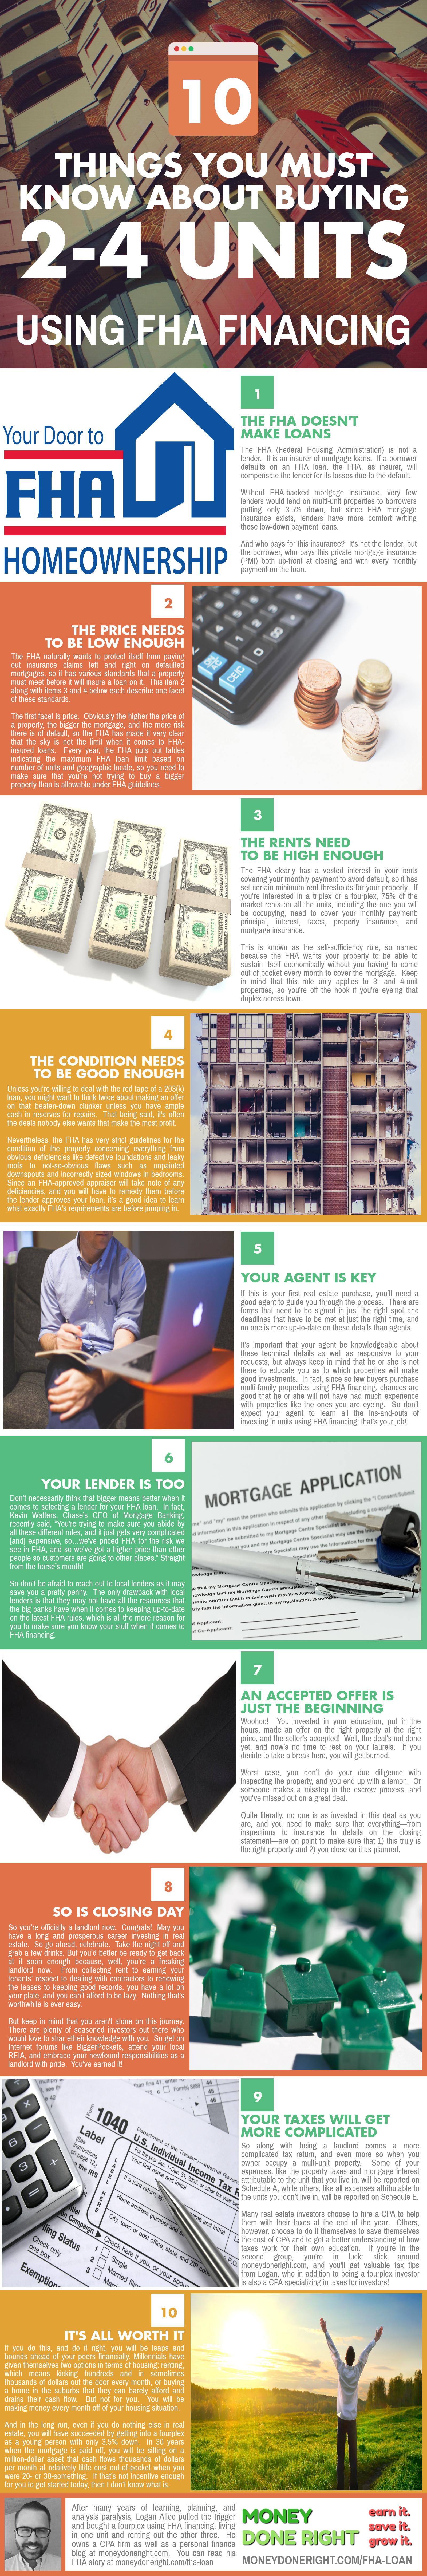 FHA Loan Rental Property